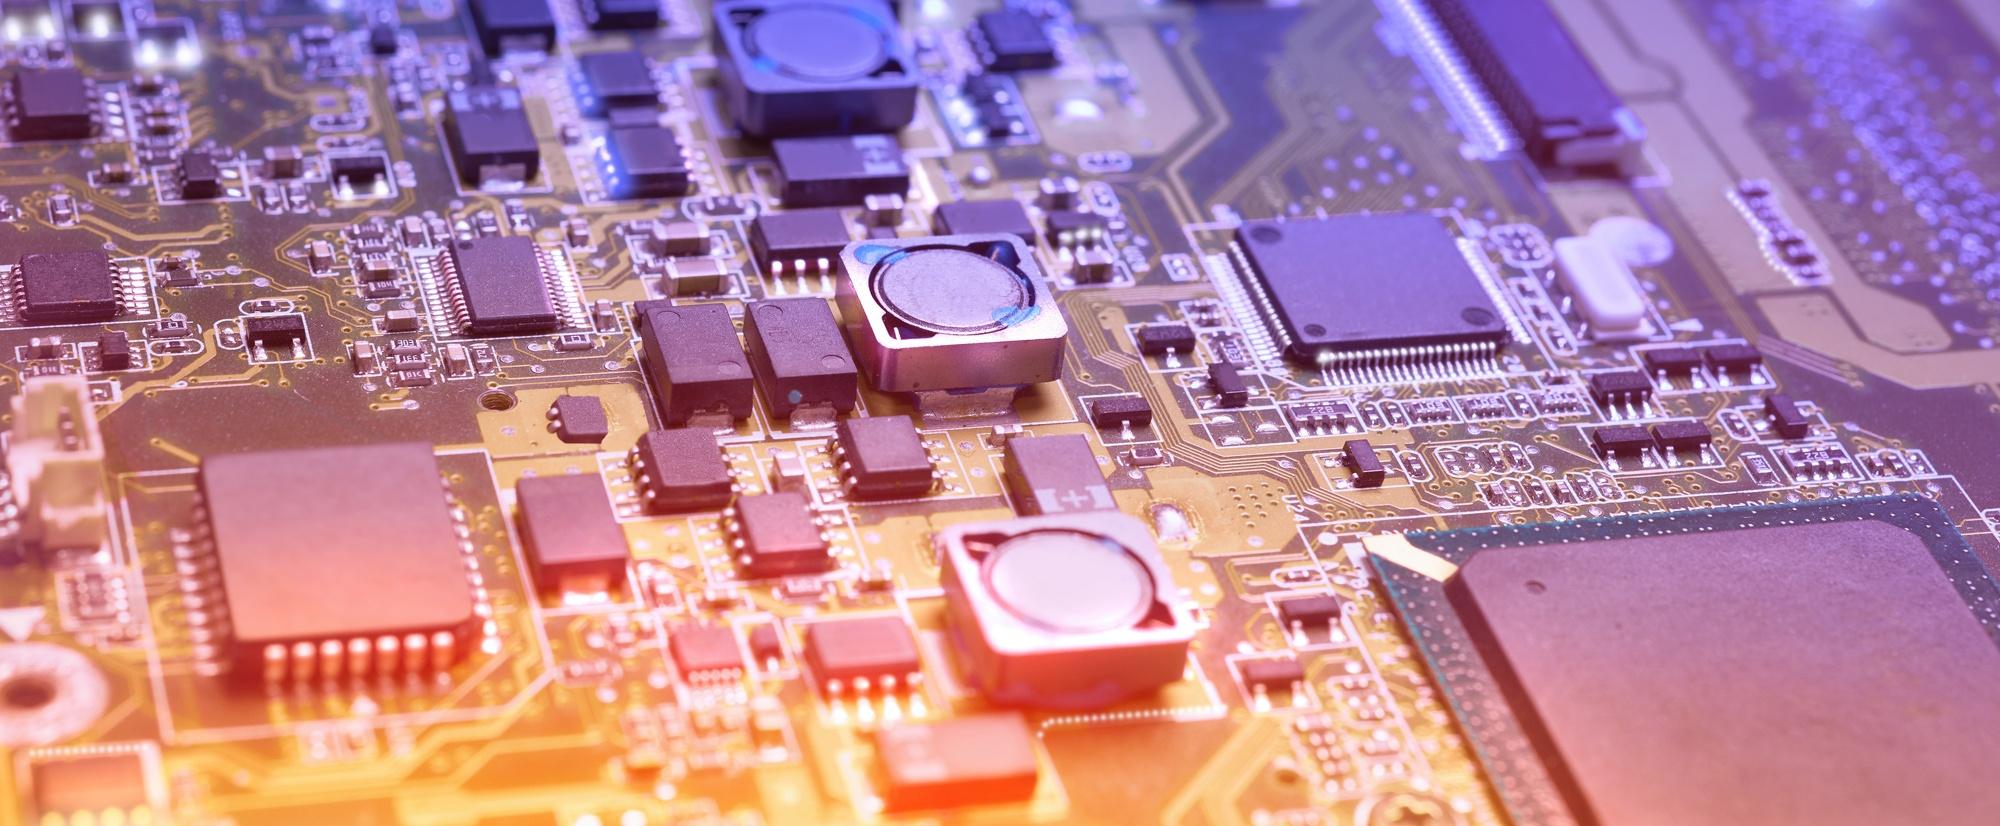 Electronics Elektronikbranche Inovationsreich Impulsgeber